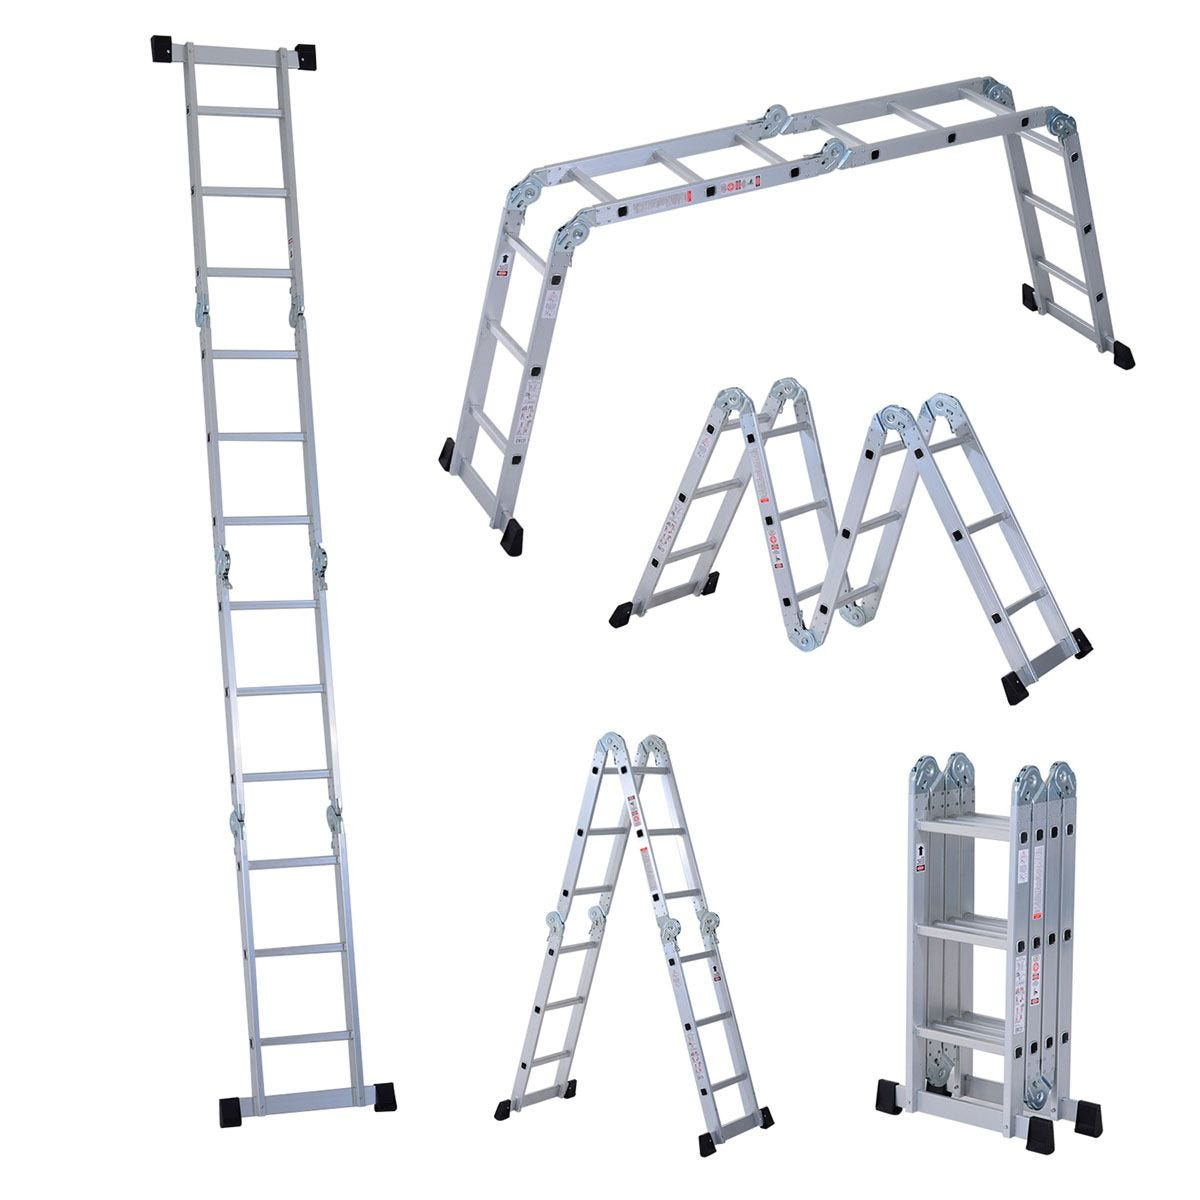 HOMCOM Foldable Platform Aluminum Ladder Multi-Functional Folding Scaffold Extension